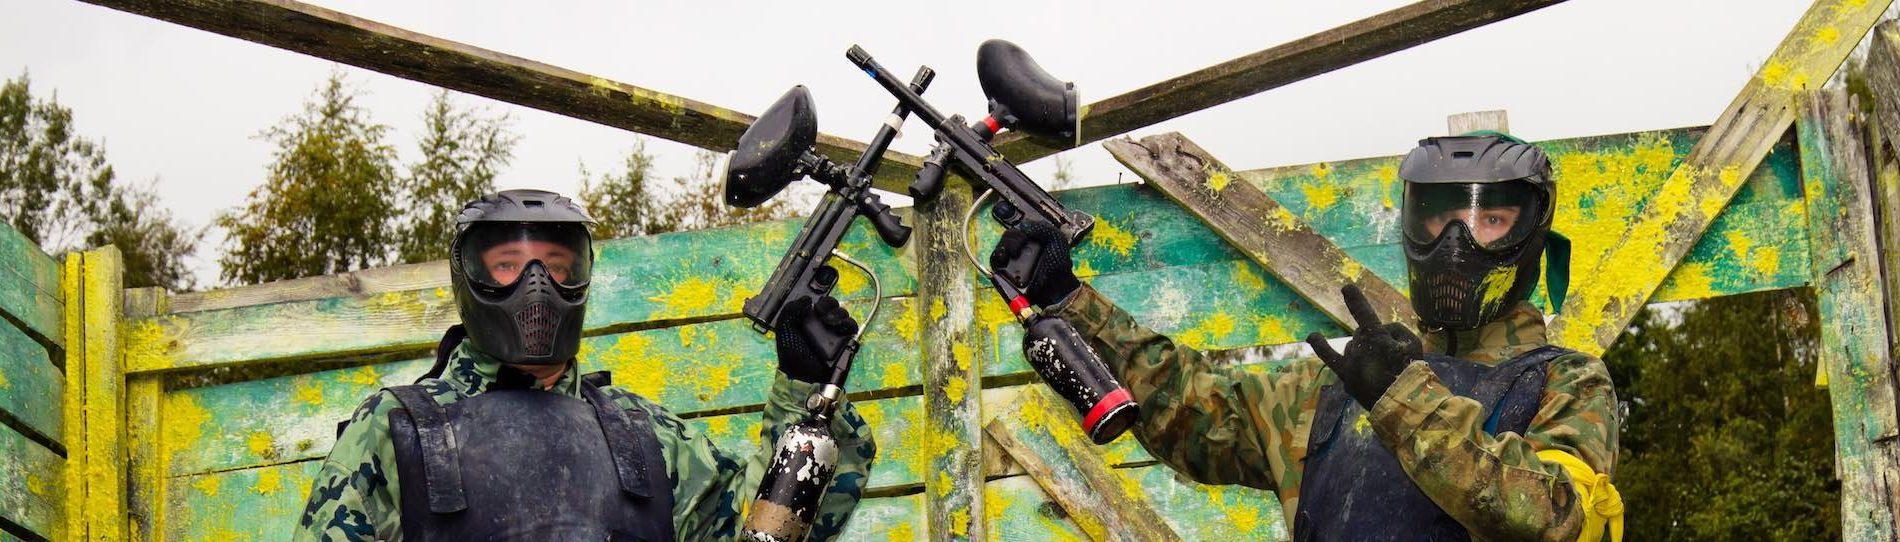 two bucks crossing paintball guns posing